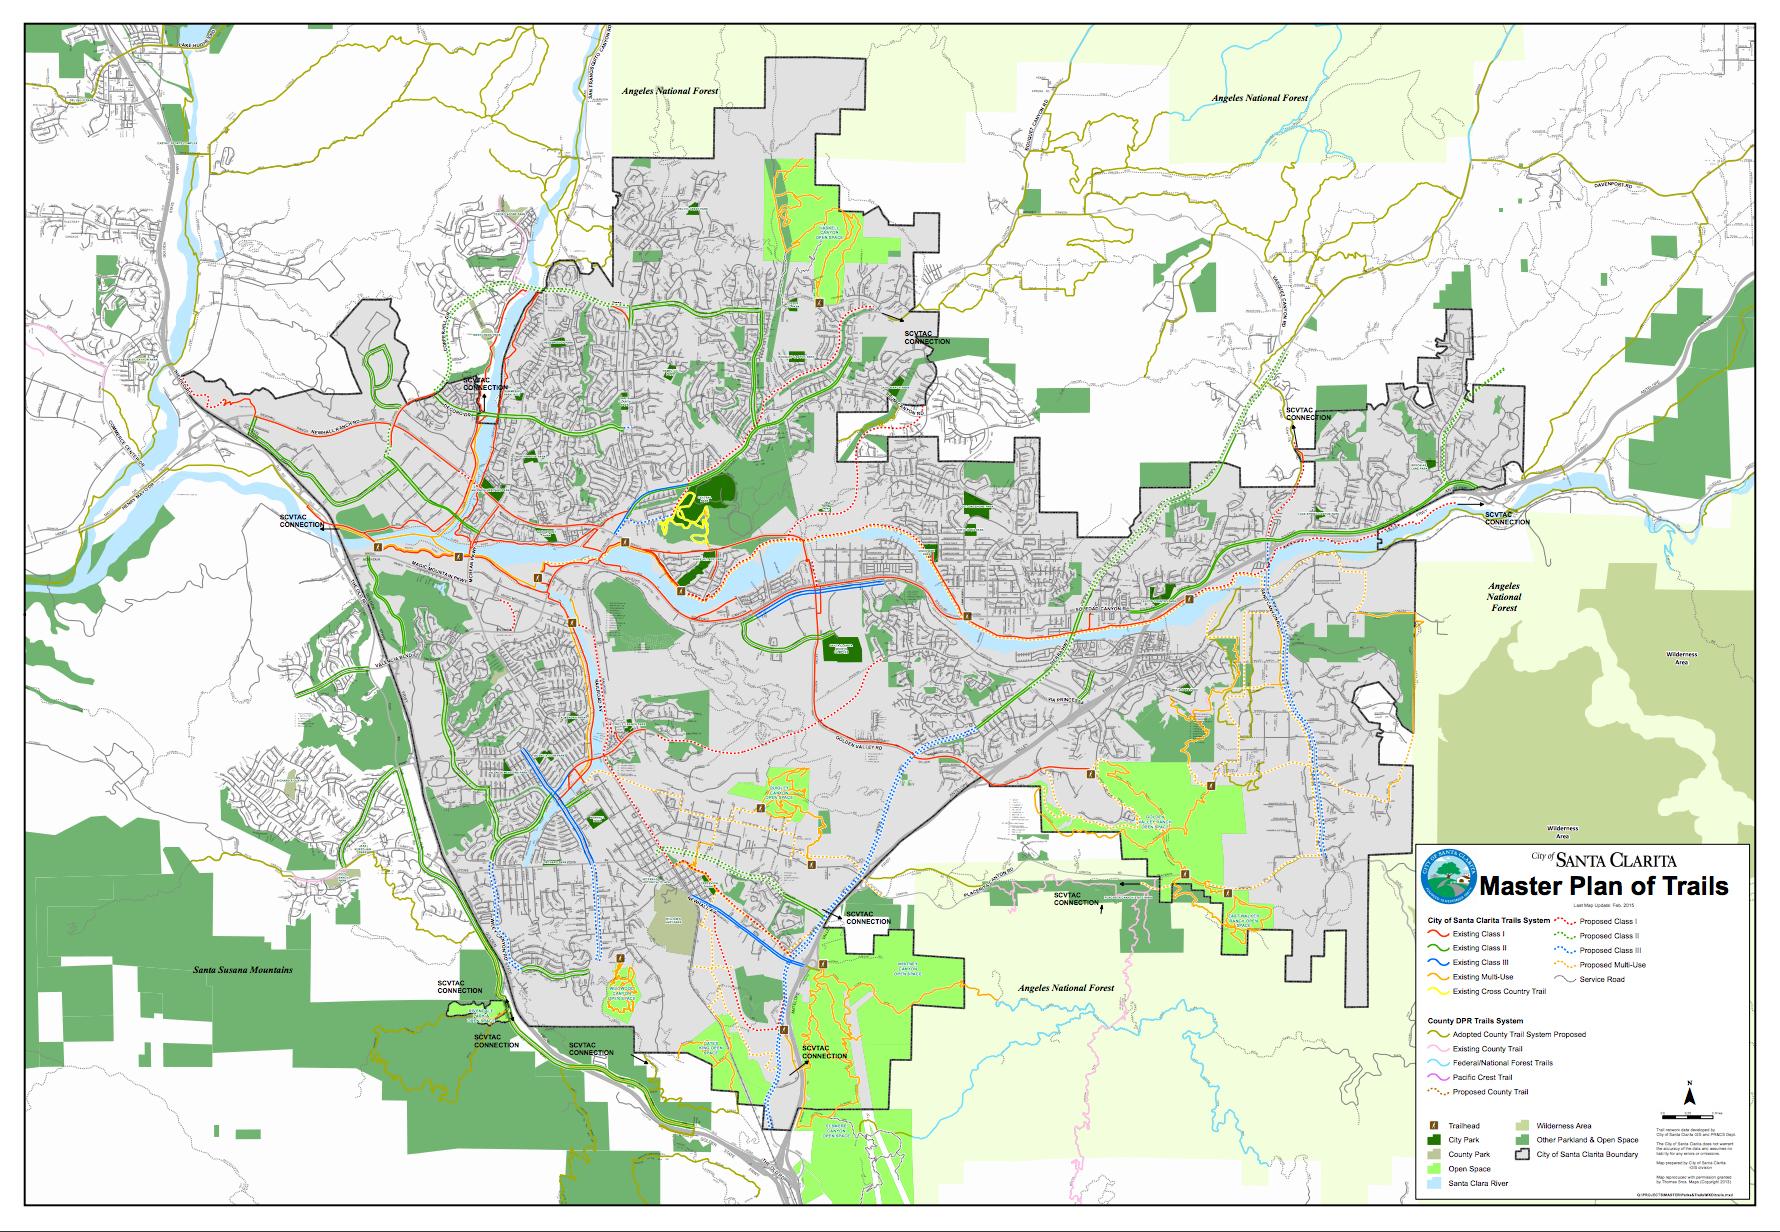 Santa Clarita California Map - Klipy - Valencia California Map